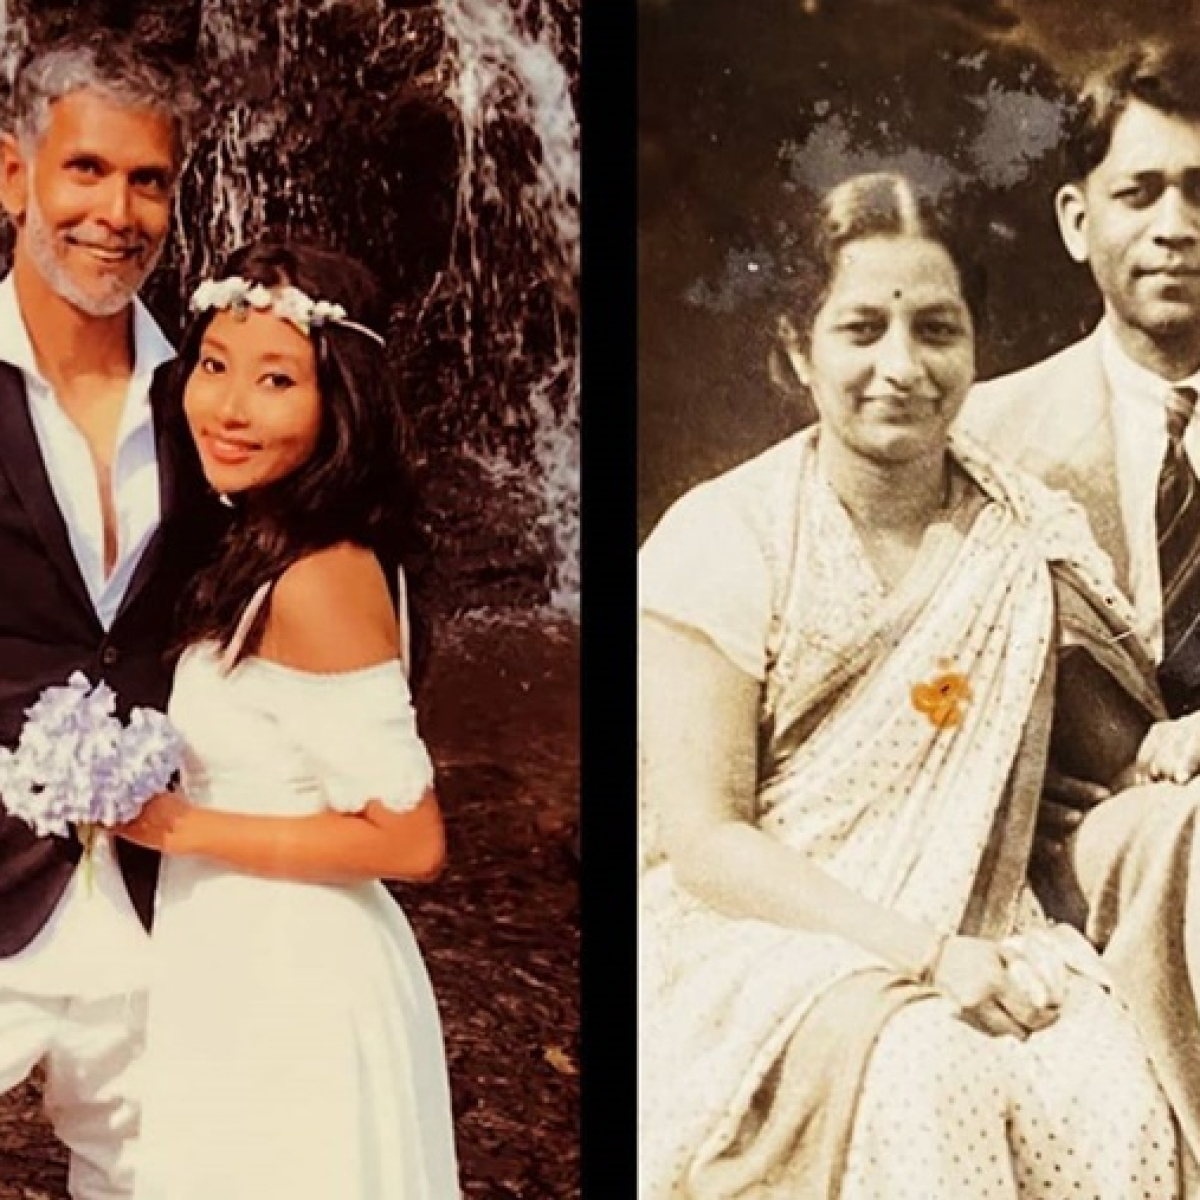 Milind Soman juxtaposes wedding picture with his grandparents' 80 years apart